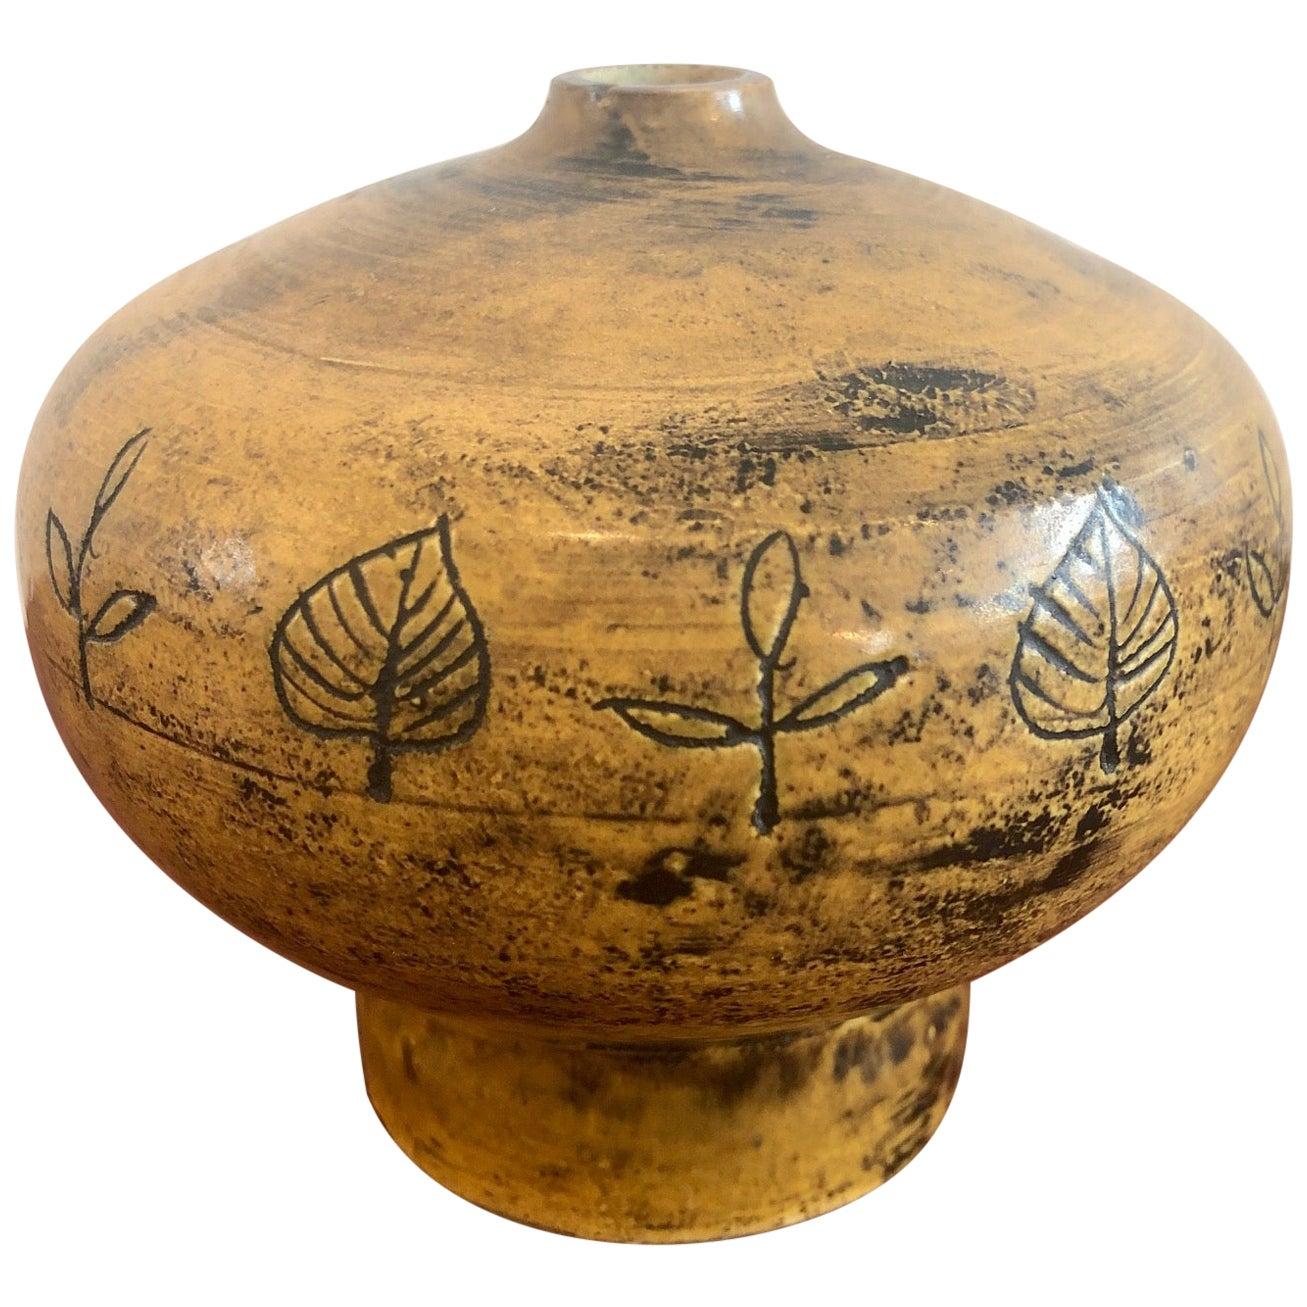 Jacques Blin Ceramic Vase